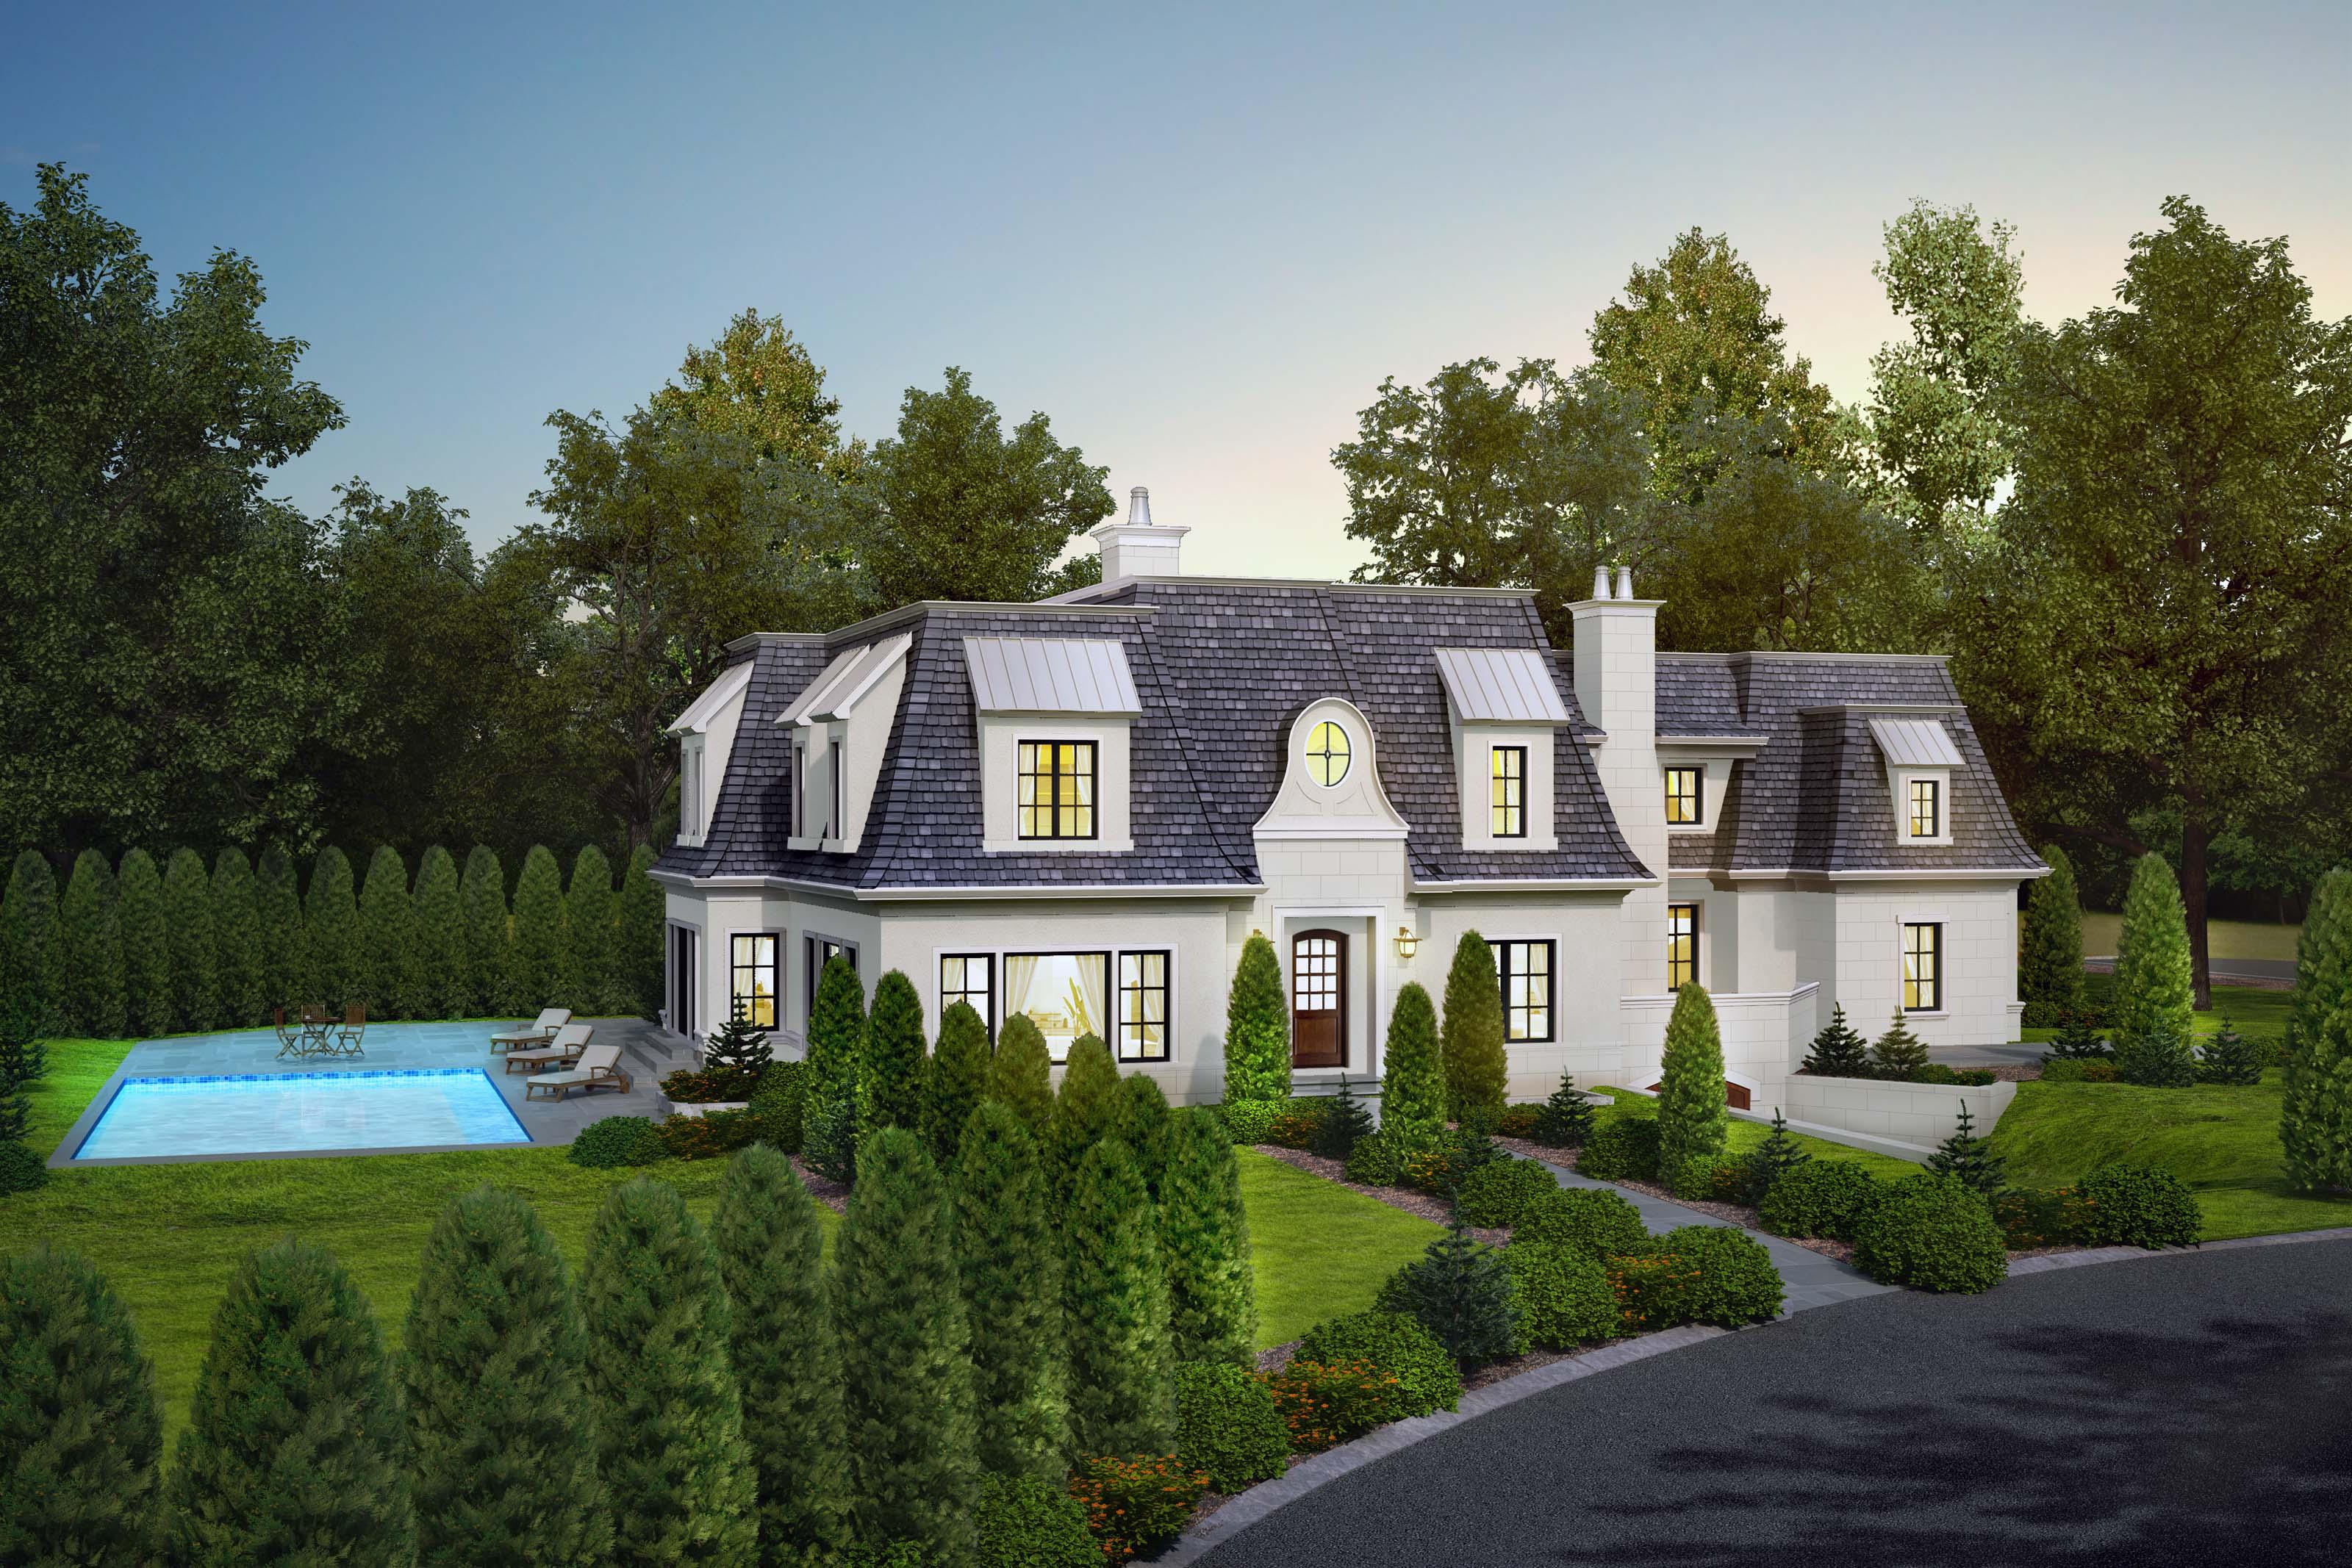 63 Homestead Rd, Tenafly, New Jersey